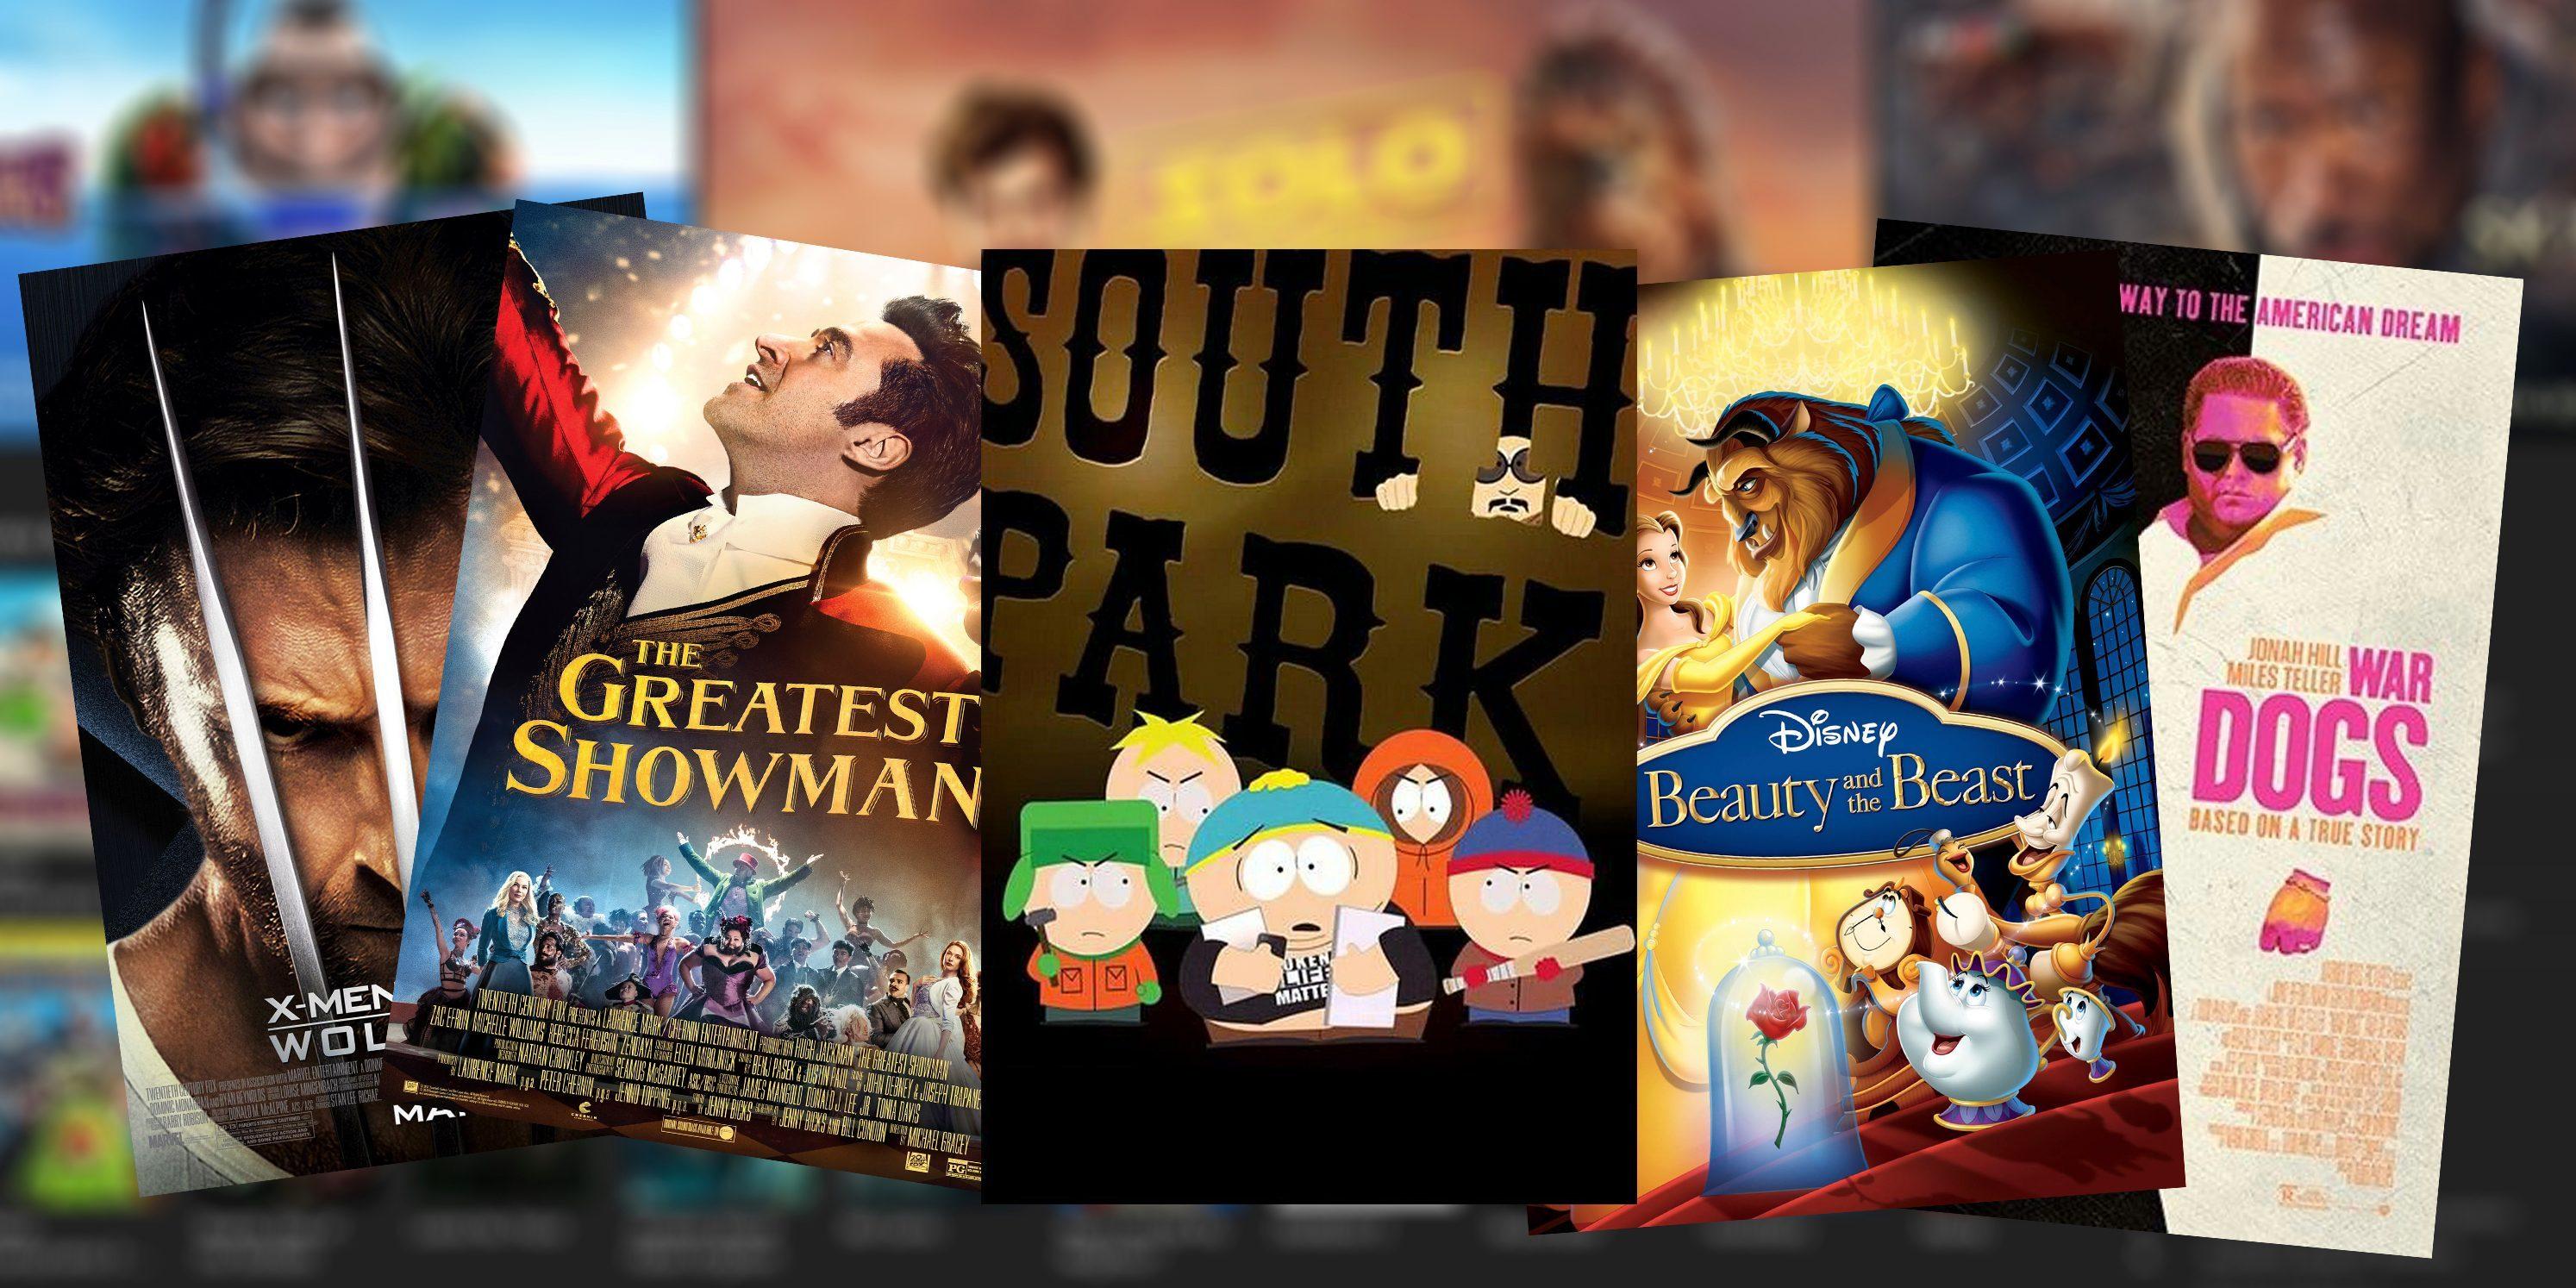 This week's best iTunes deals: 9 X-Men Films $50, South Park Seasons $10, $1 rental, more